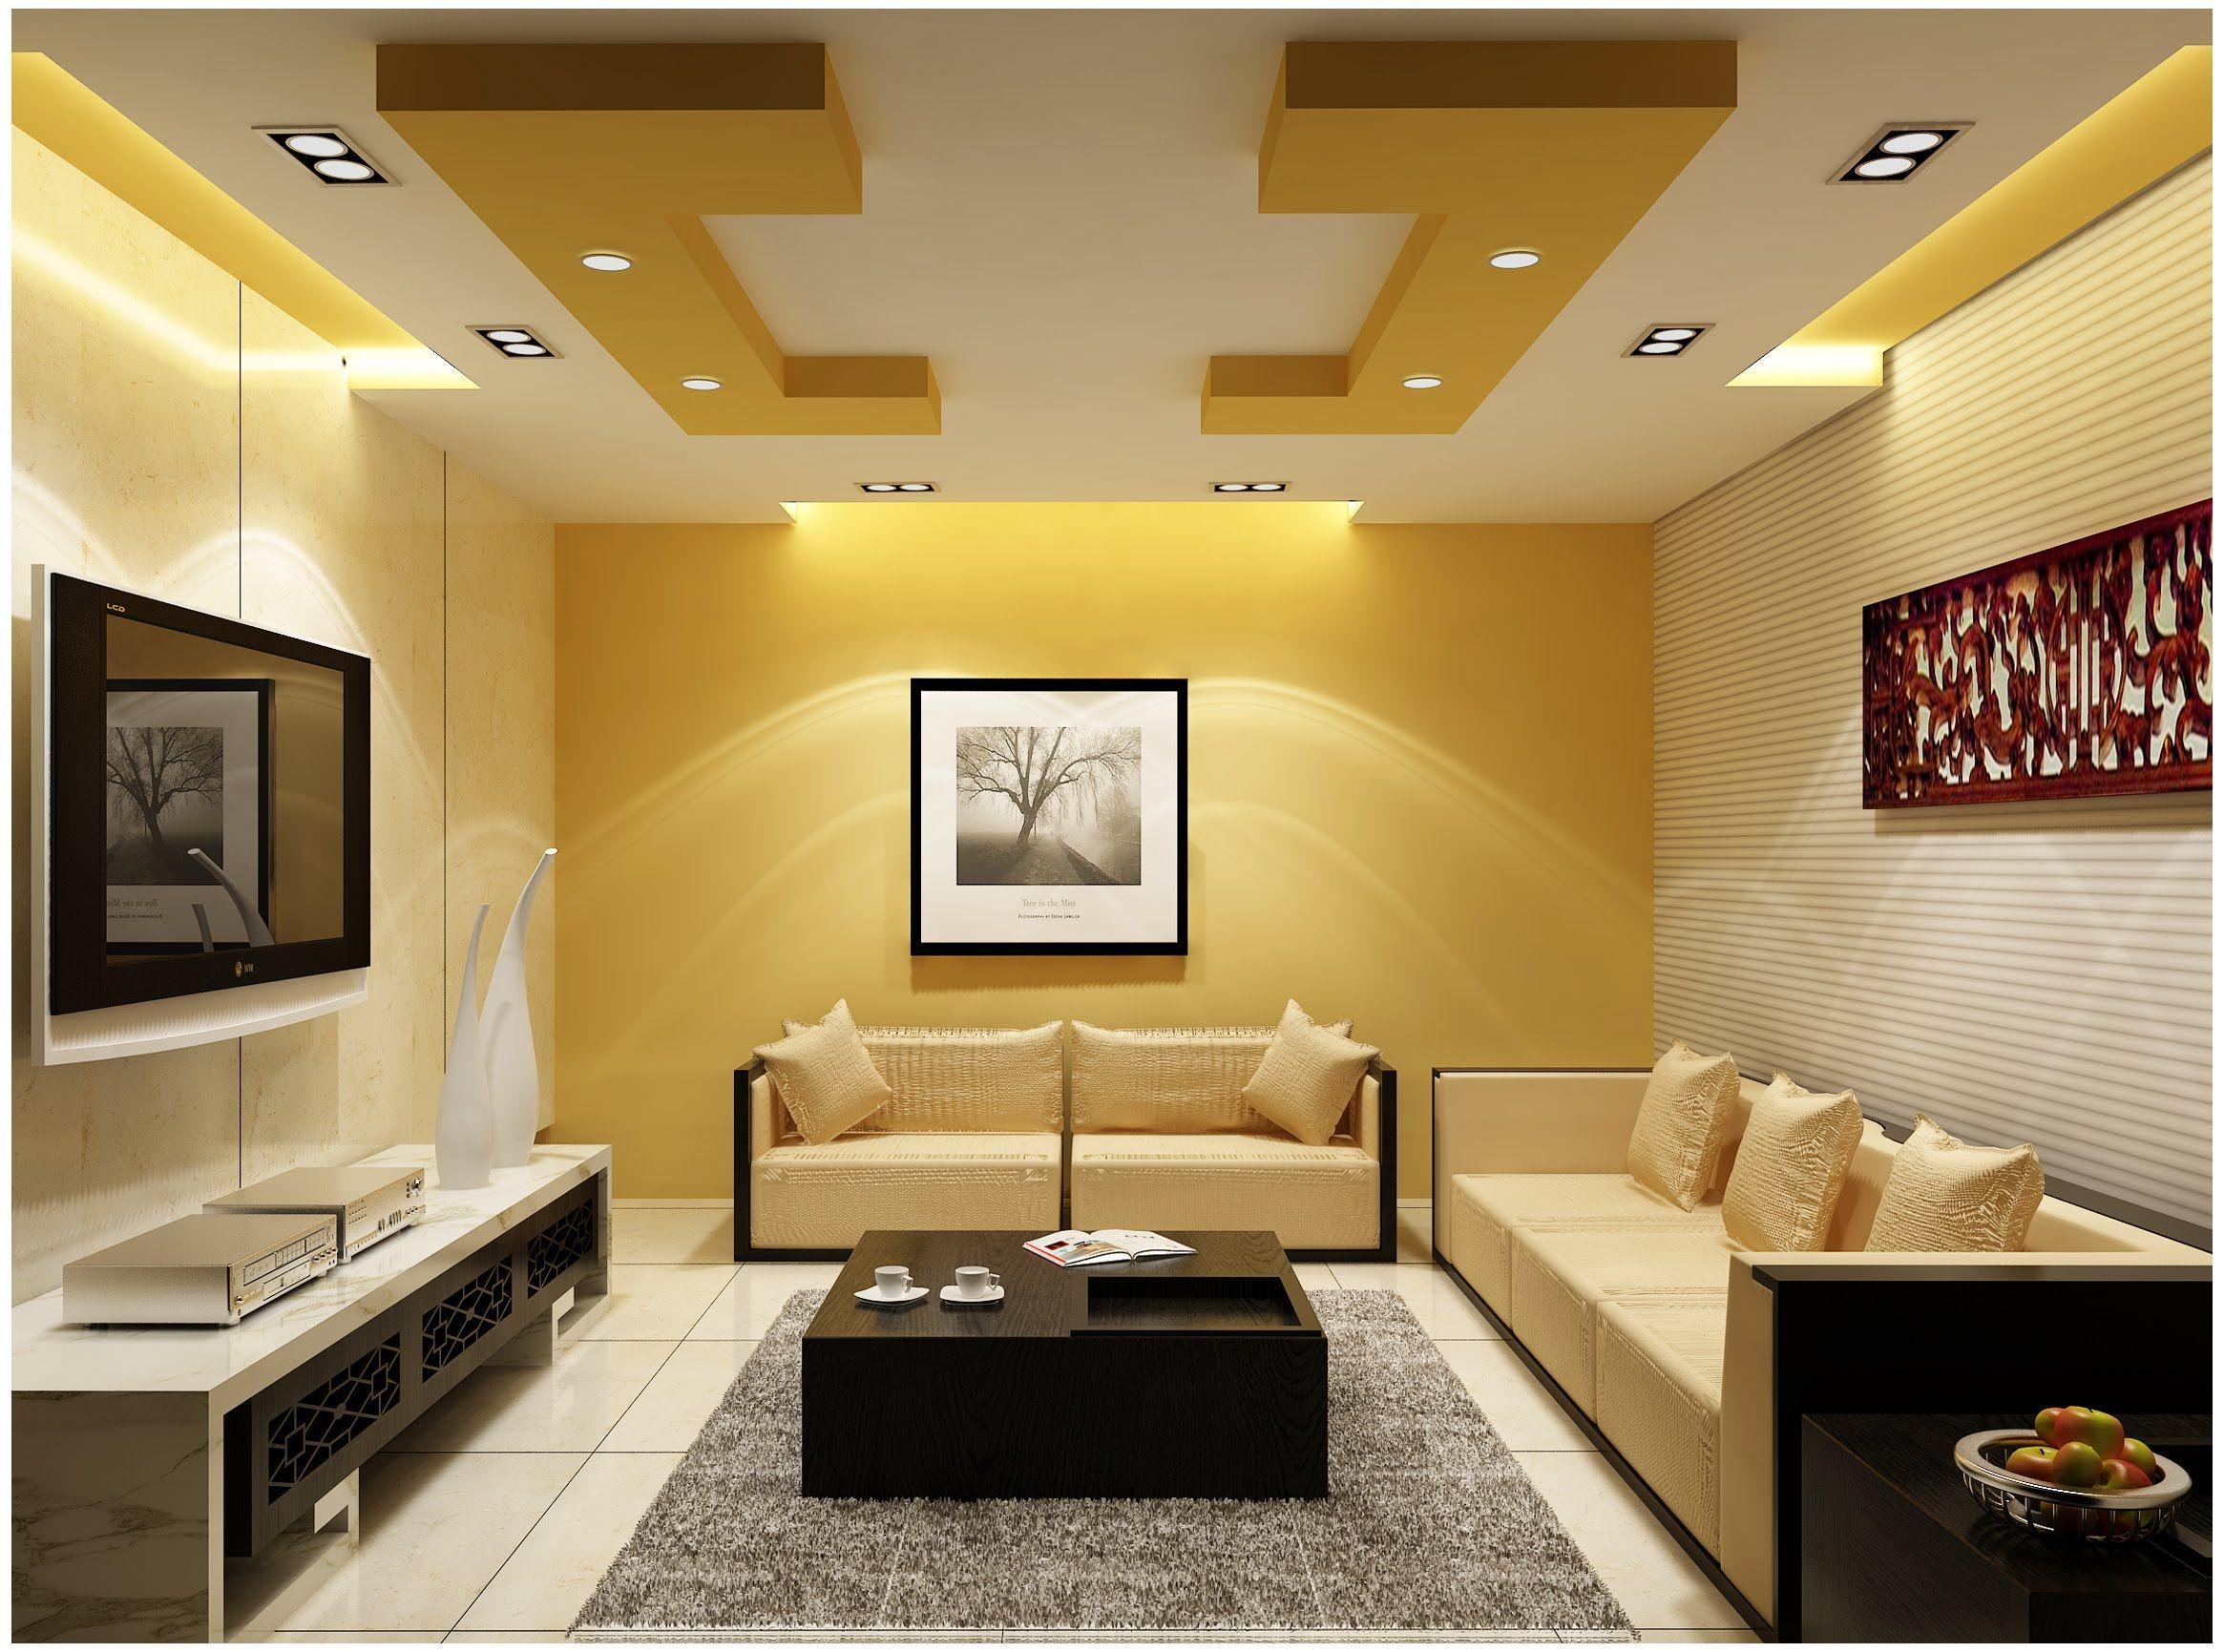 Ceiling Design Hall Living Room Ceiling Design Living Room Ceiling Design Modern Pop Ceiling Design